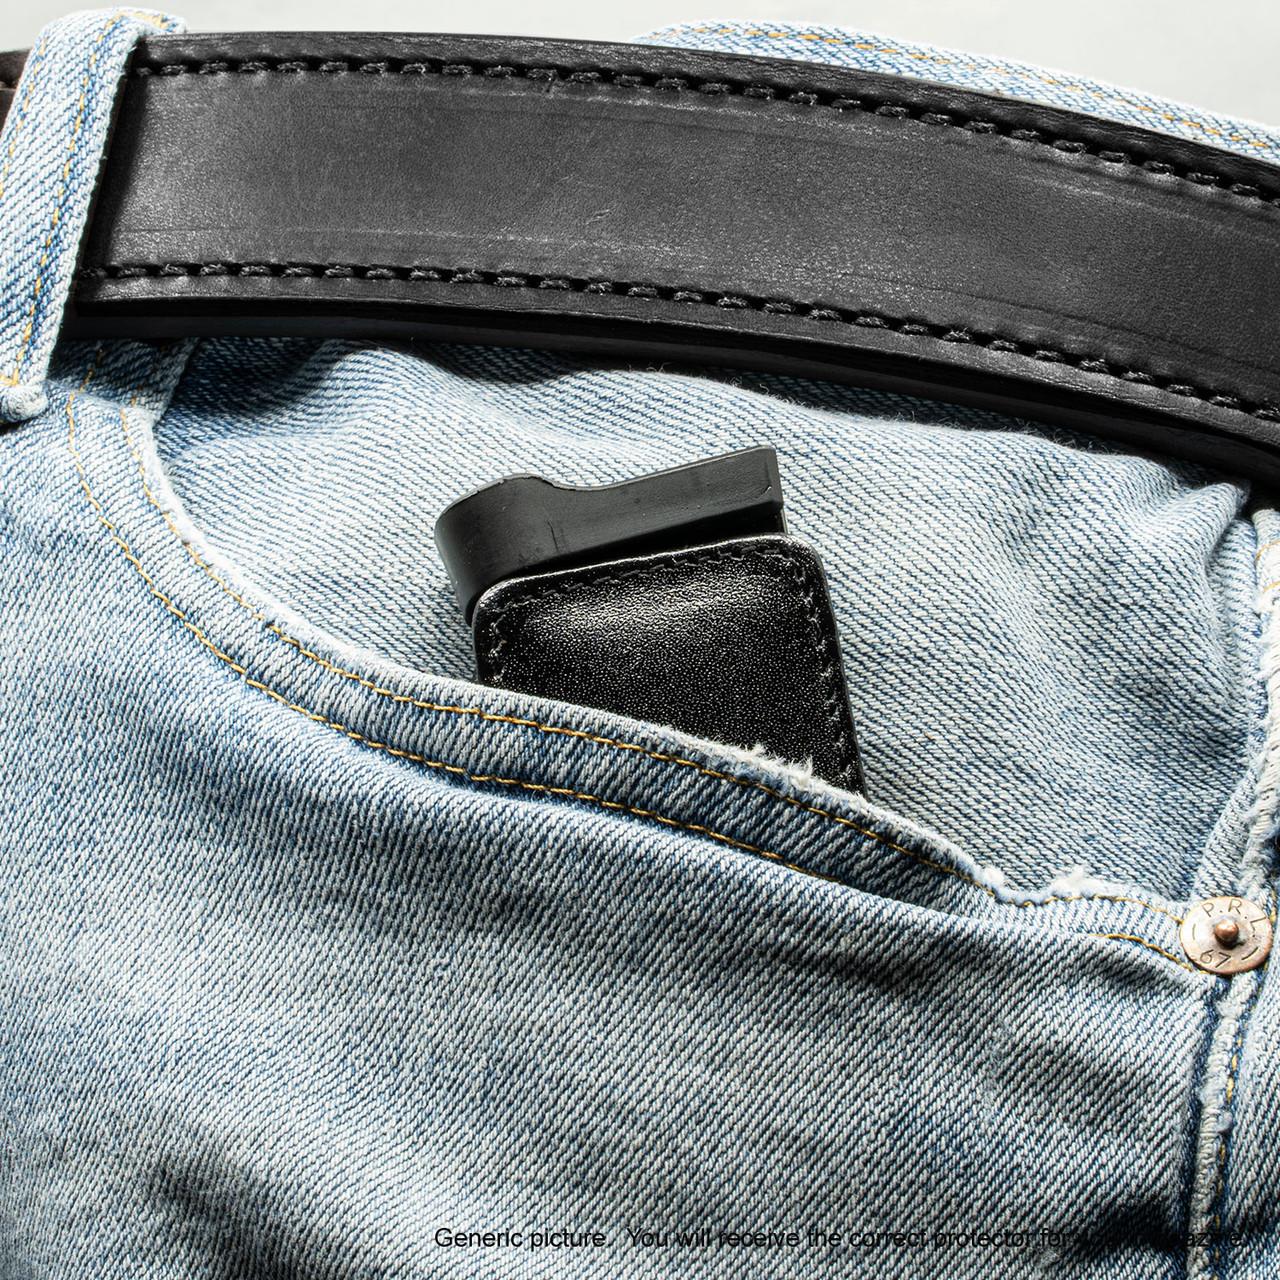 M&P 40c Black Leather Magazine Pocket Protector